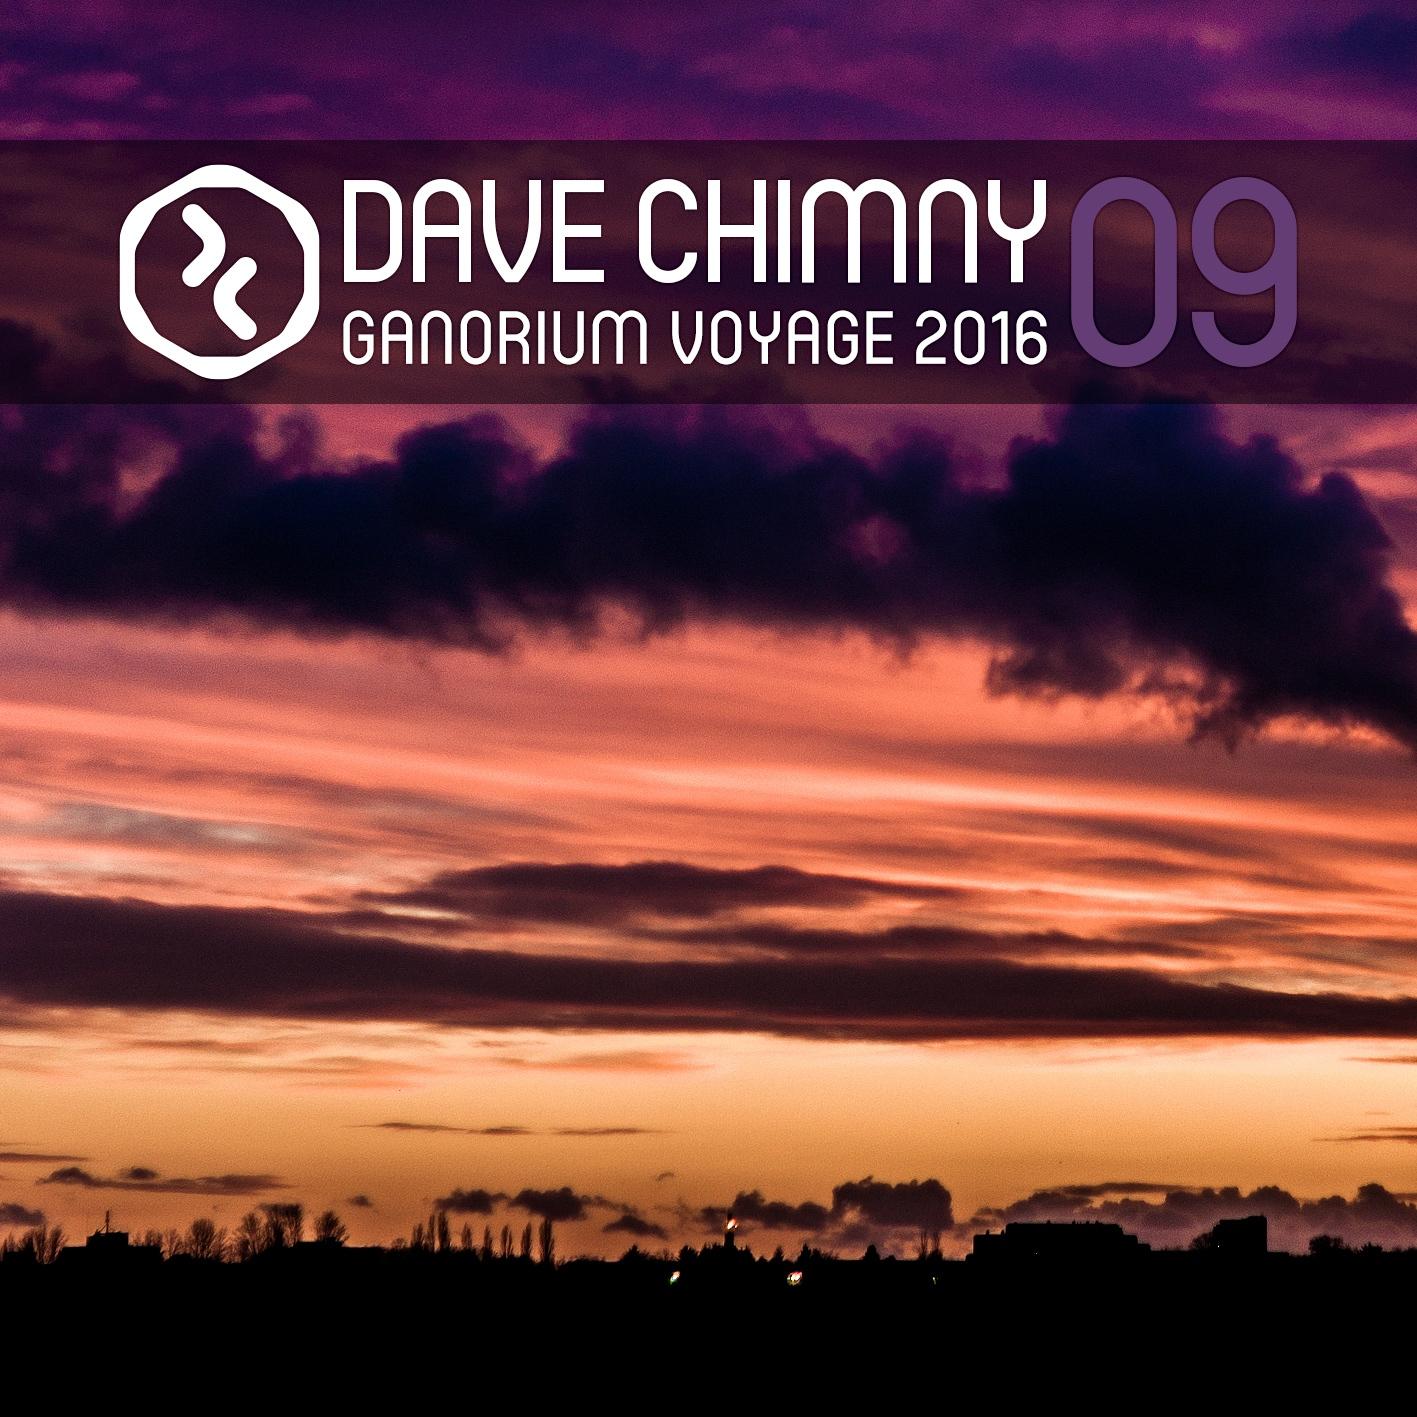 Dave Chimny – Ganorium Voyage 2016-09